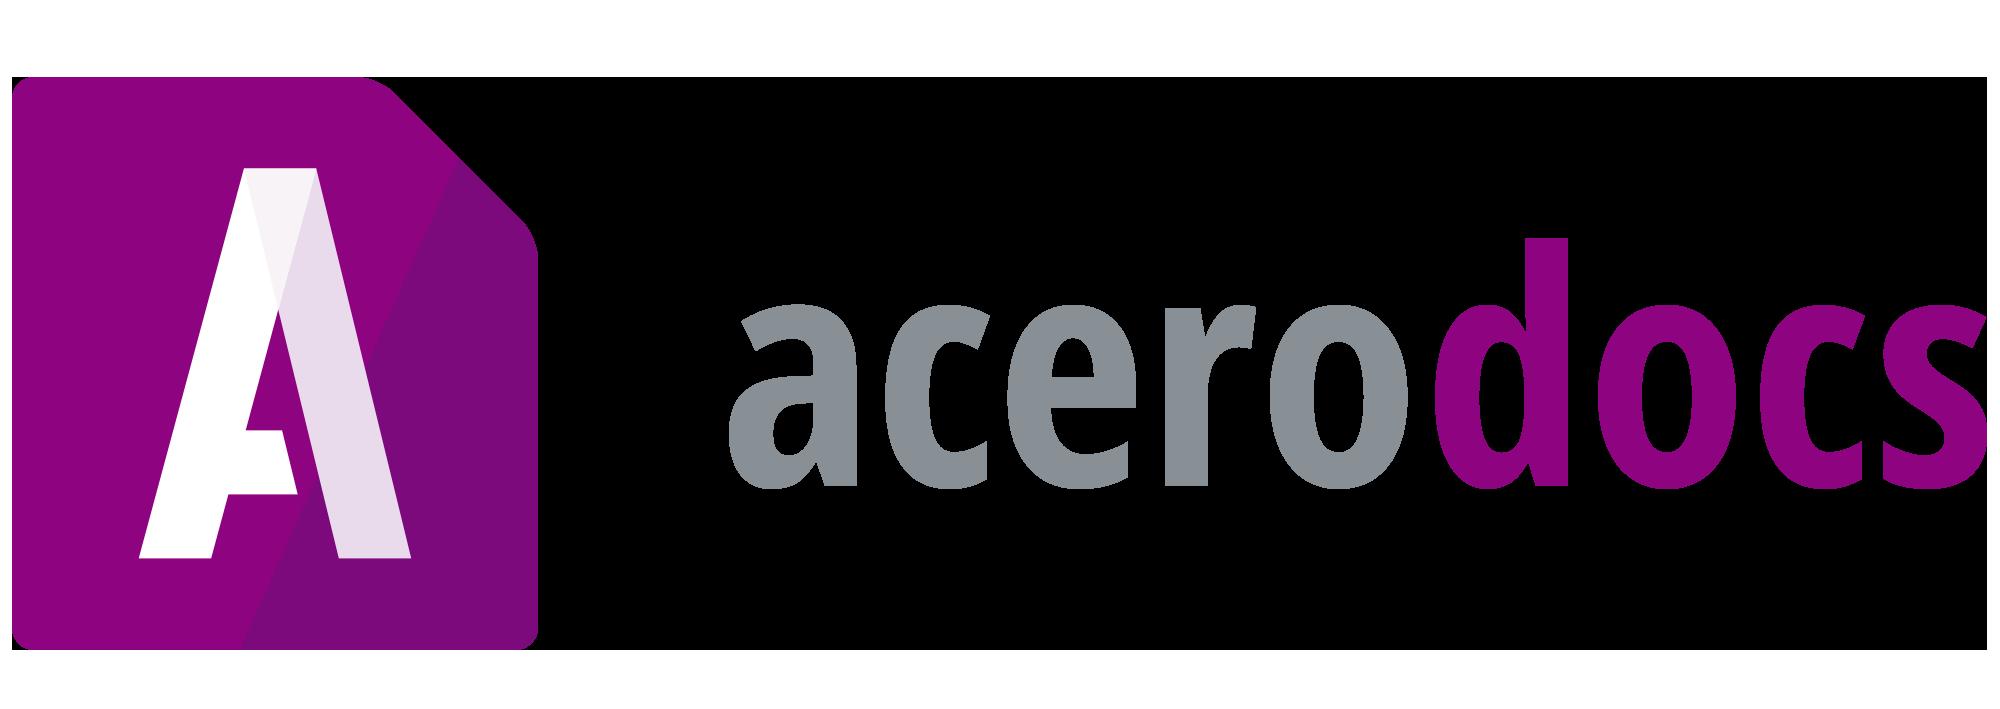 logo_Acerodocs